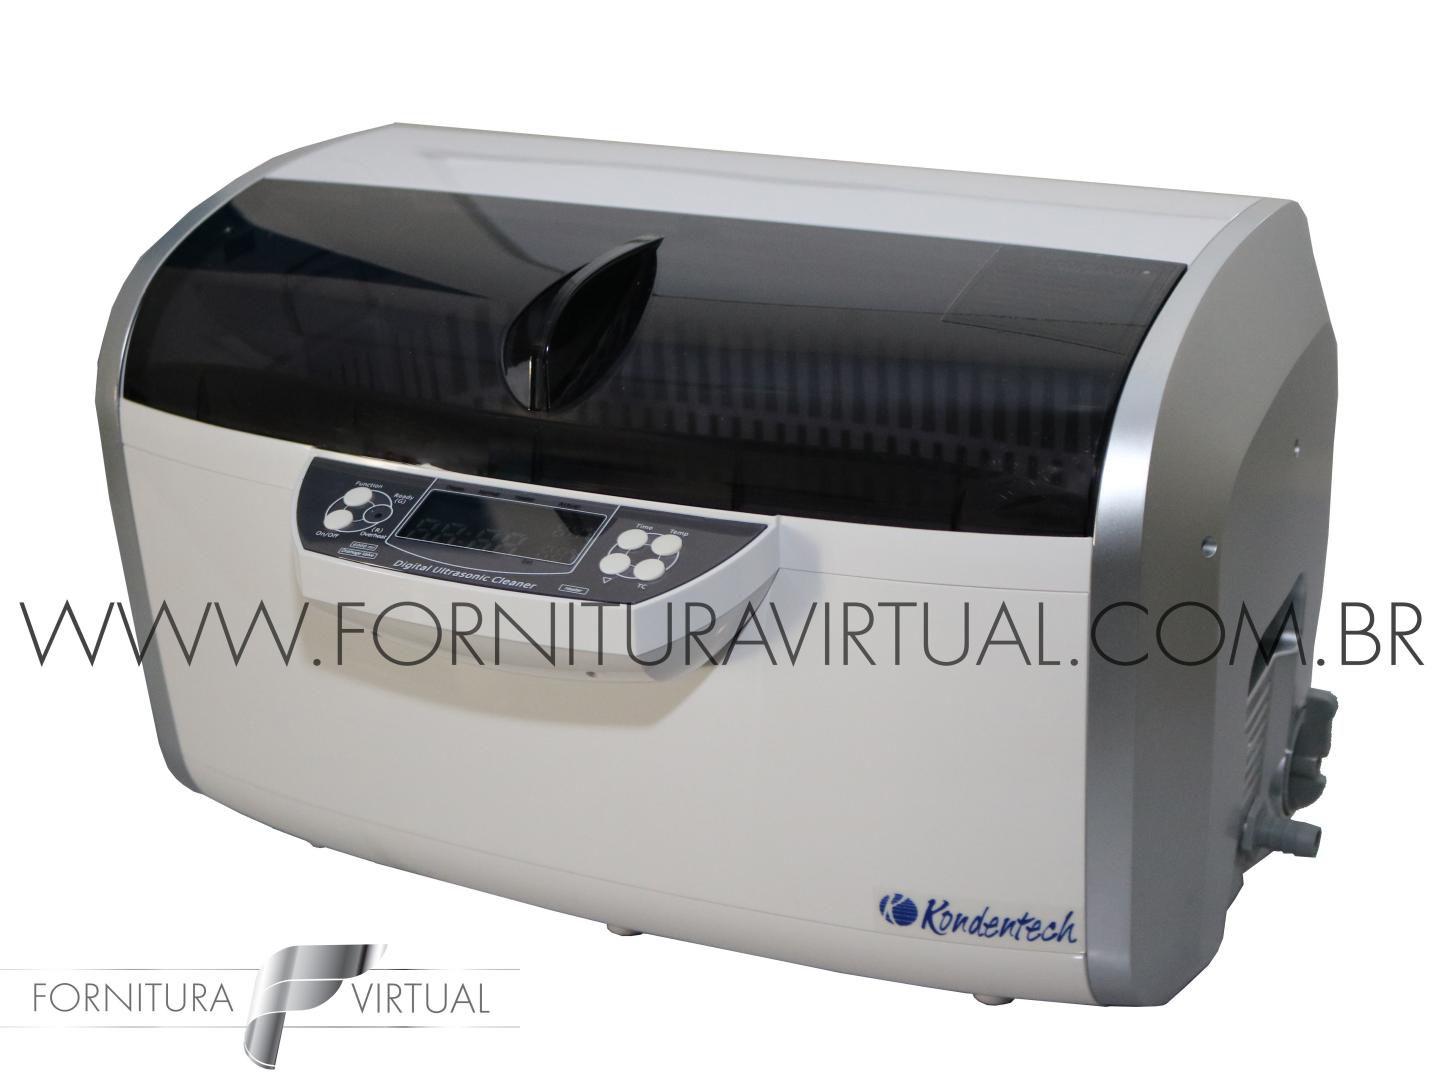 Cuba Lavadora Ultrassônica Digital Kondentech - CD-4860